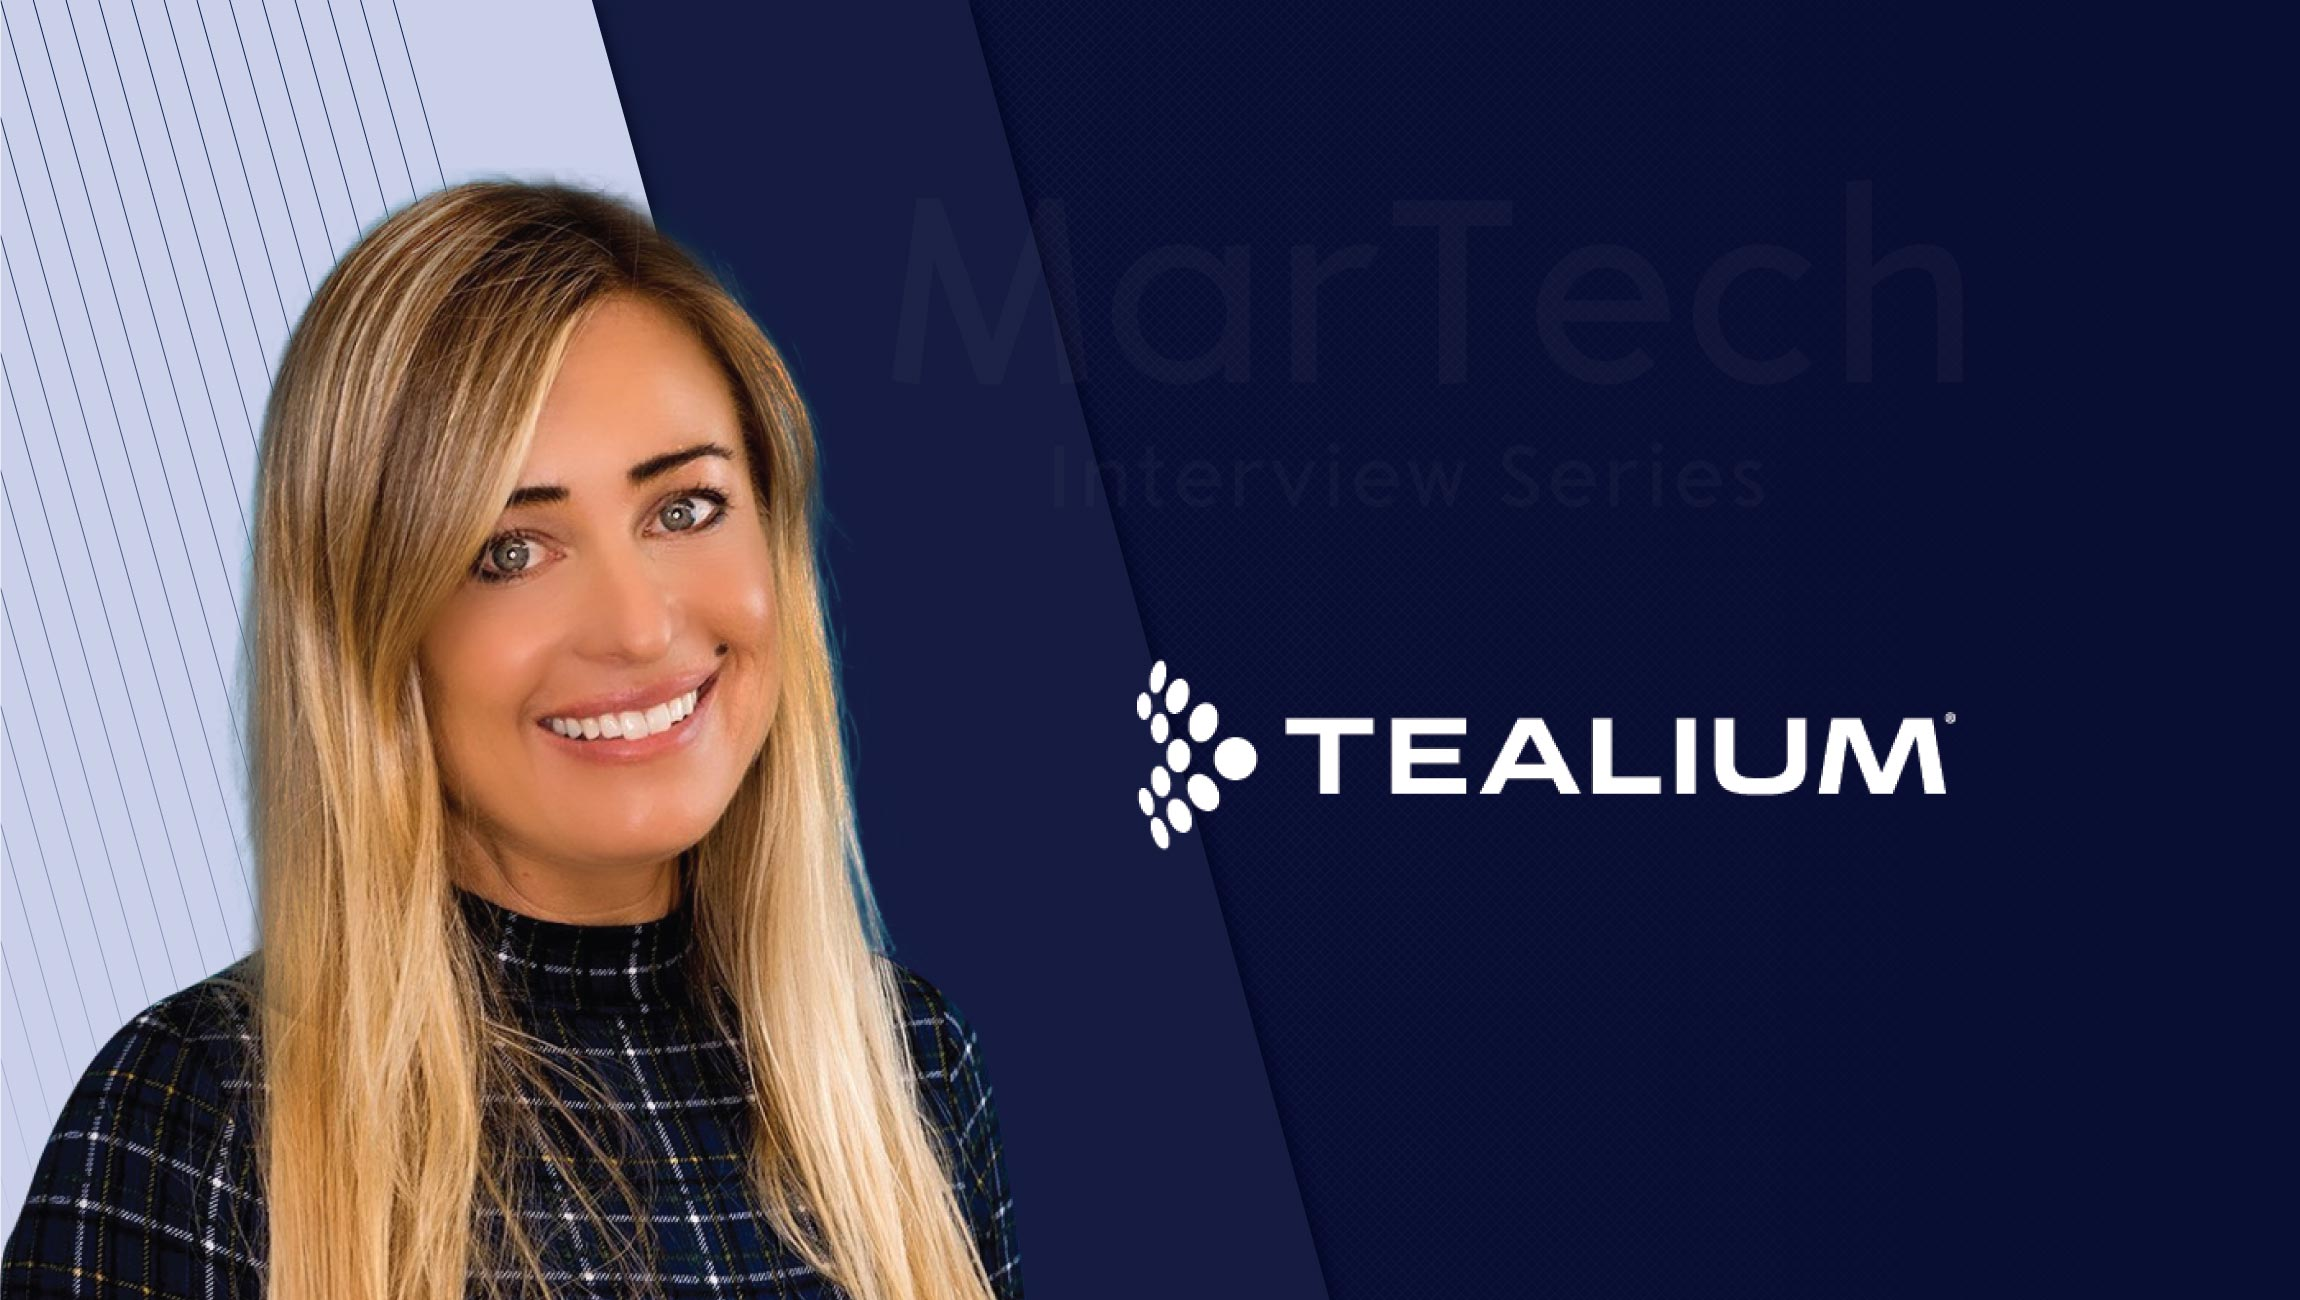 MarTech Interview with Heidi Bullock, CMO at Tealium